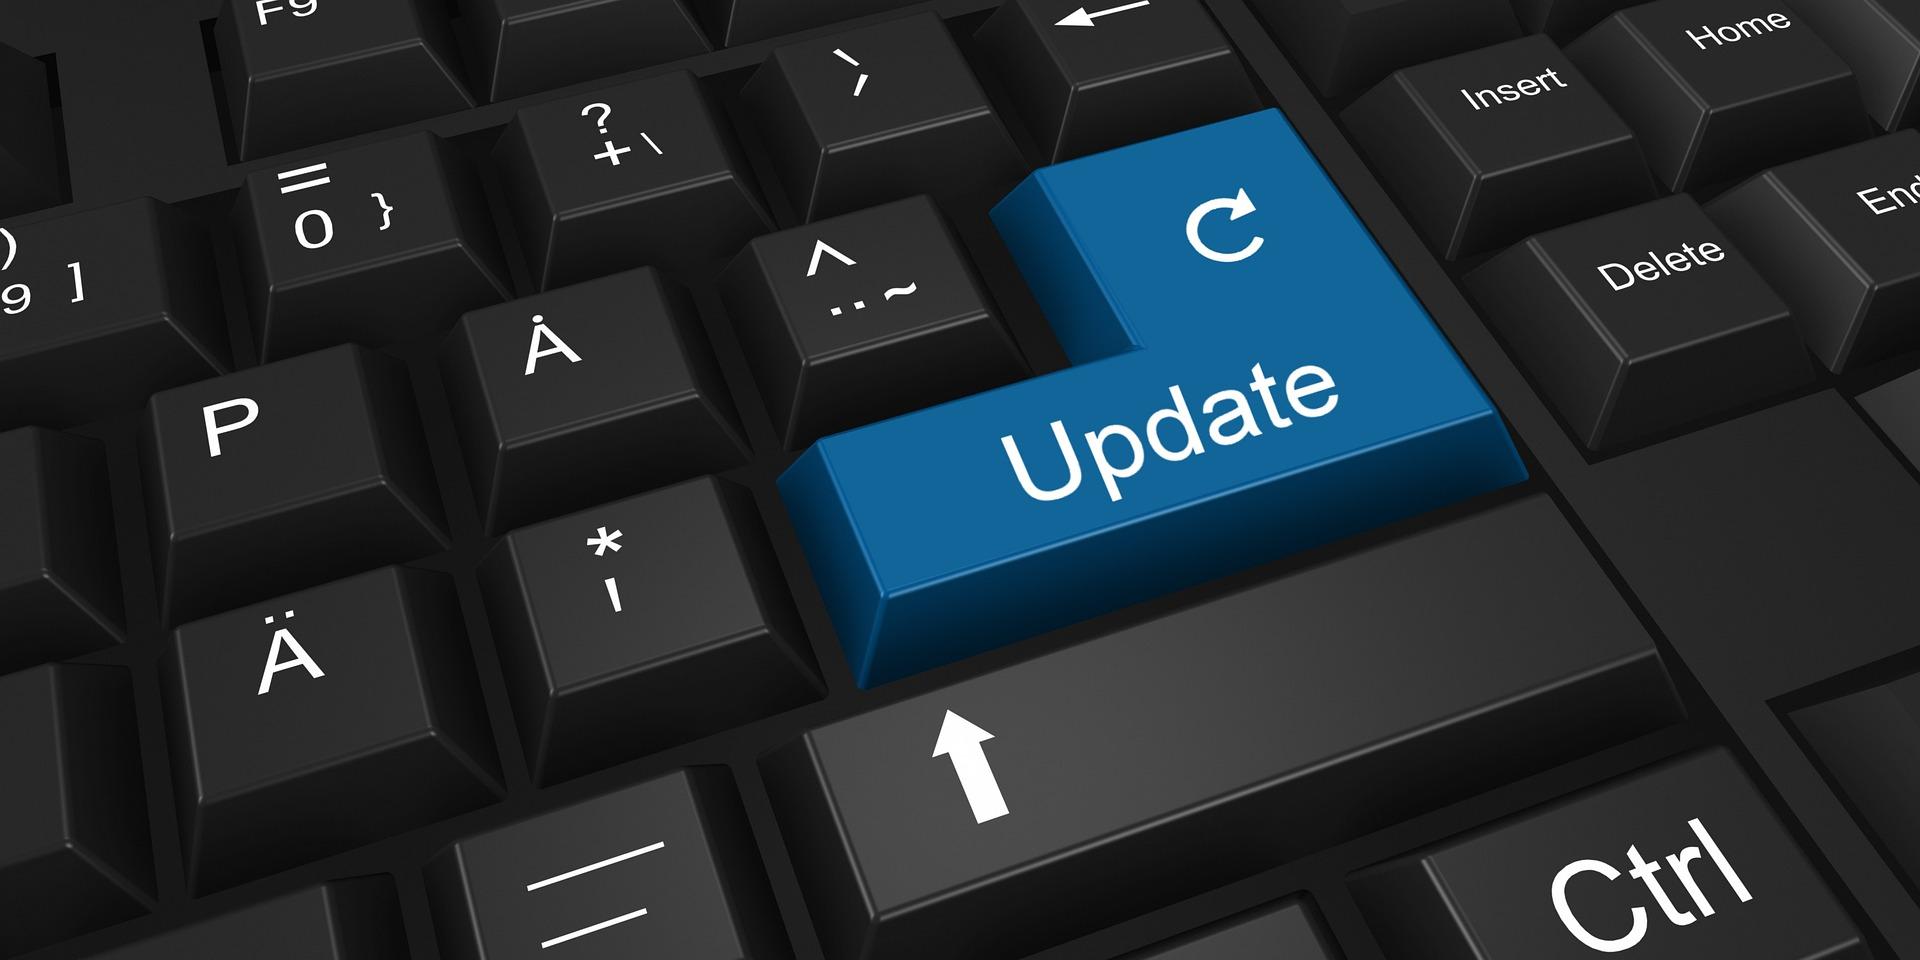 update-4223736_19205.jpg